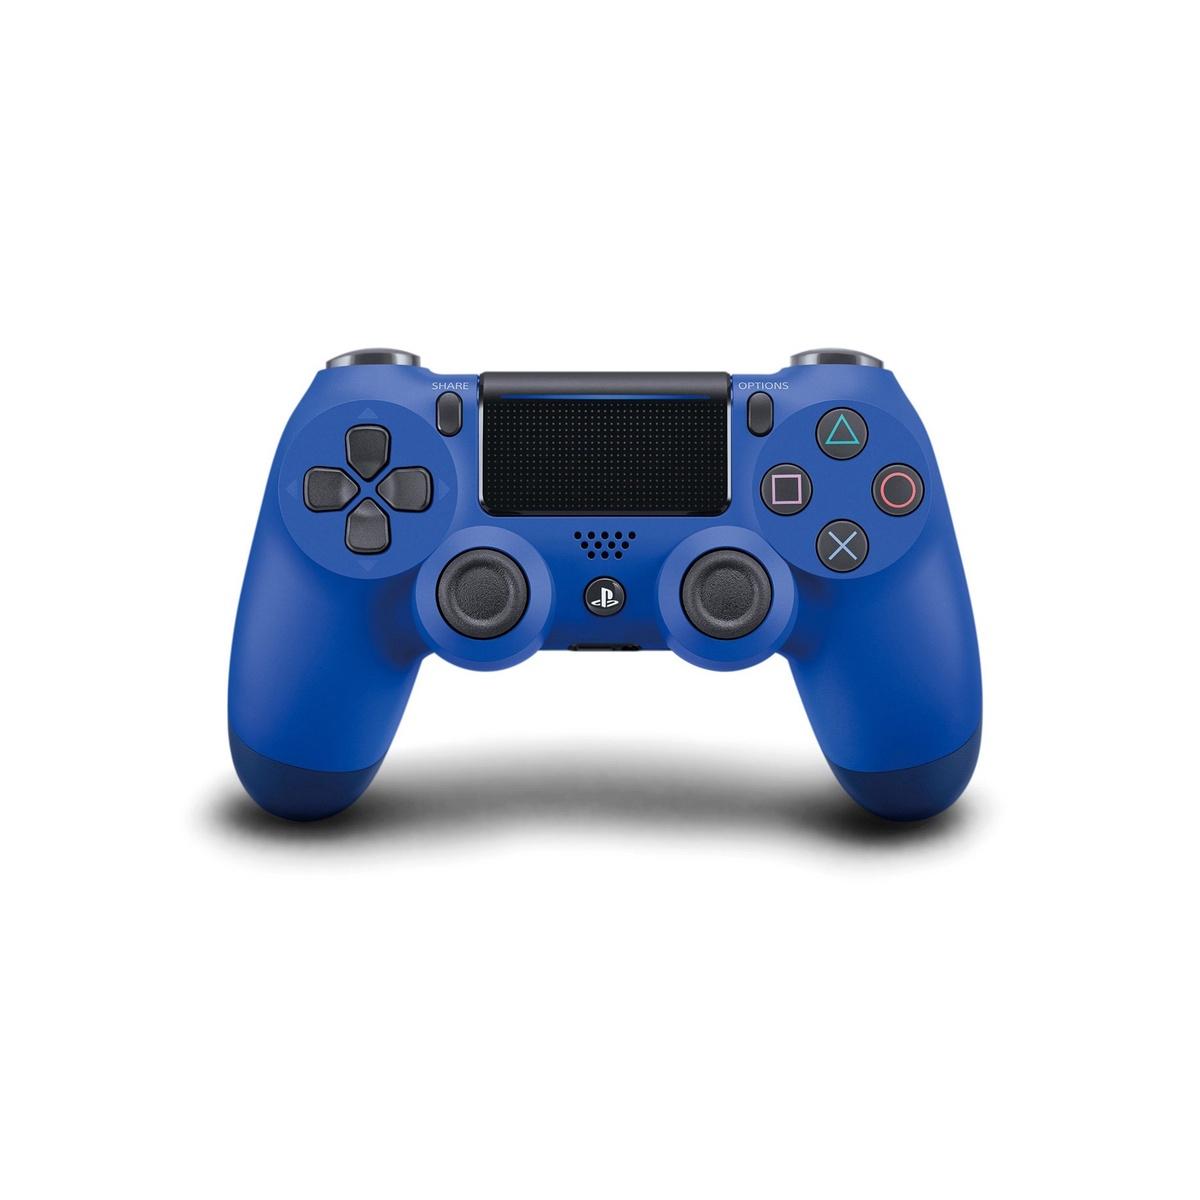 093e870717b Sony DualShock 4 Controller V2 Wave Blue